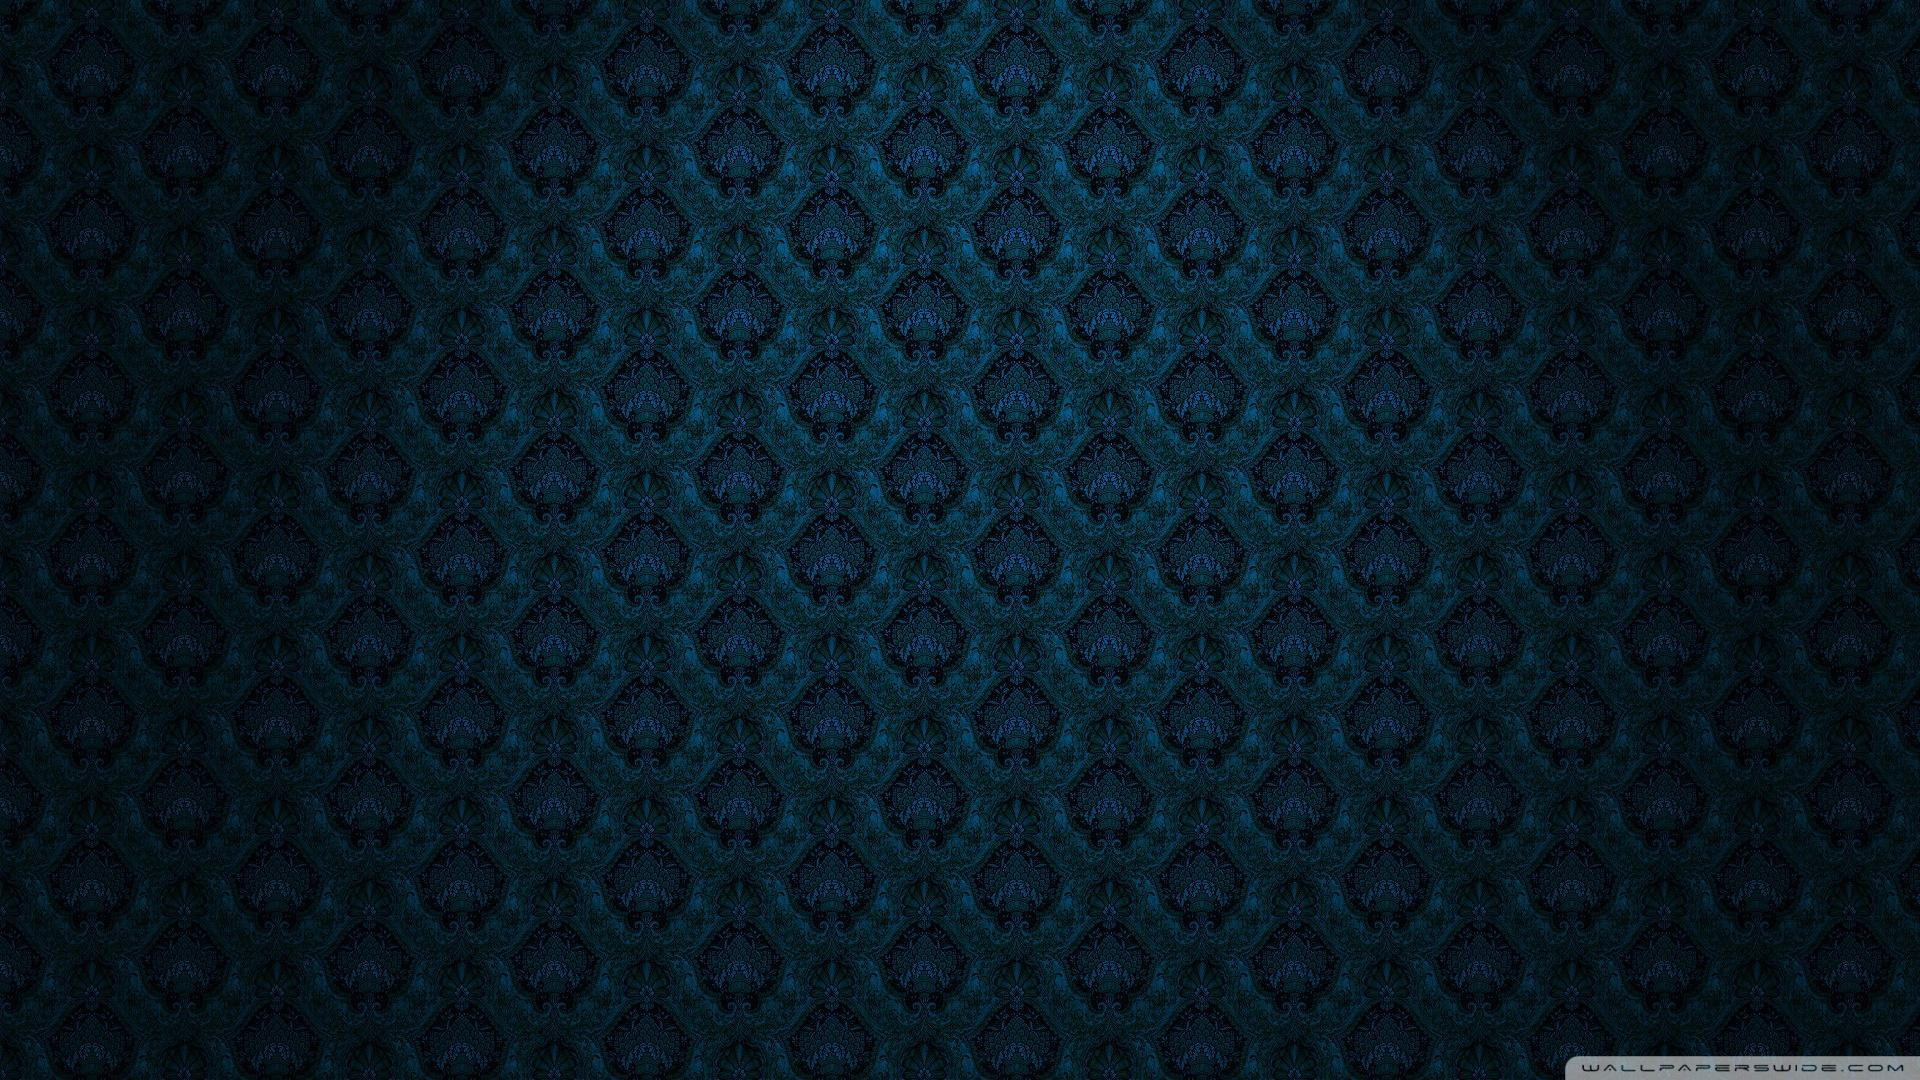 Victorian Gothic Wallpaper 1920x1080 victorian wallpaper 1920x1080